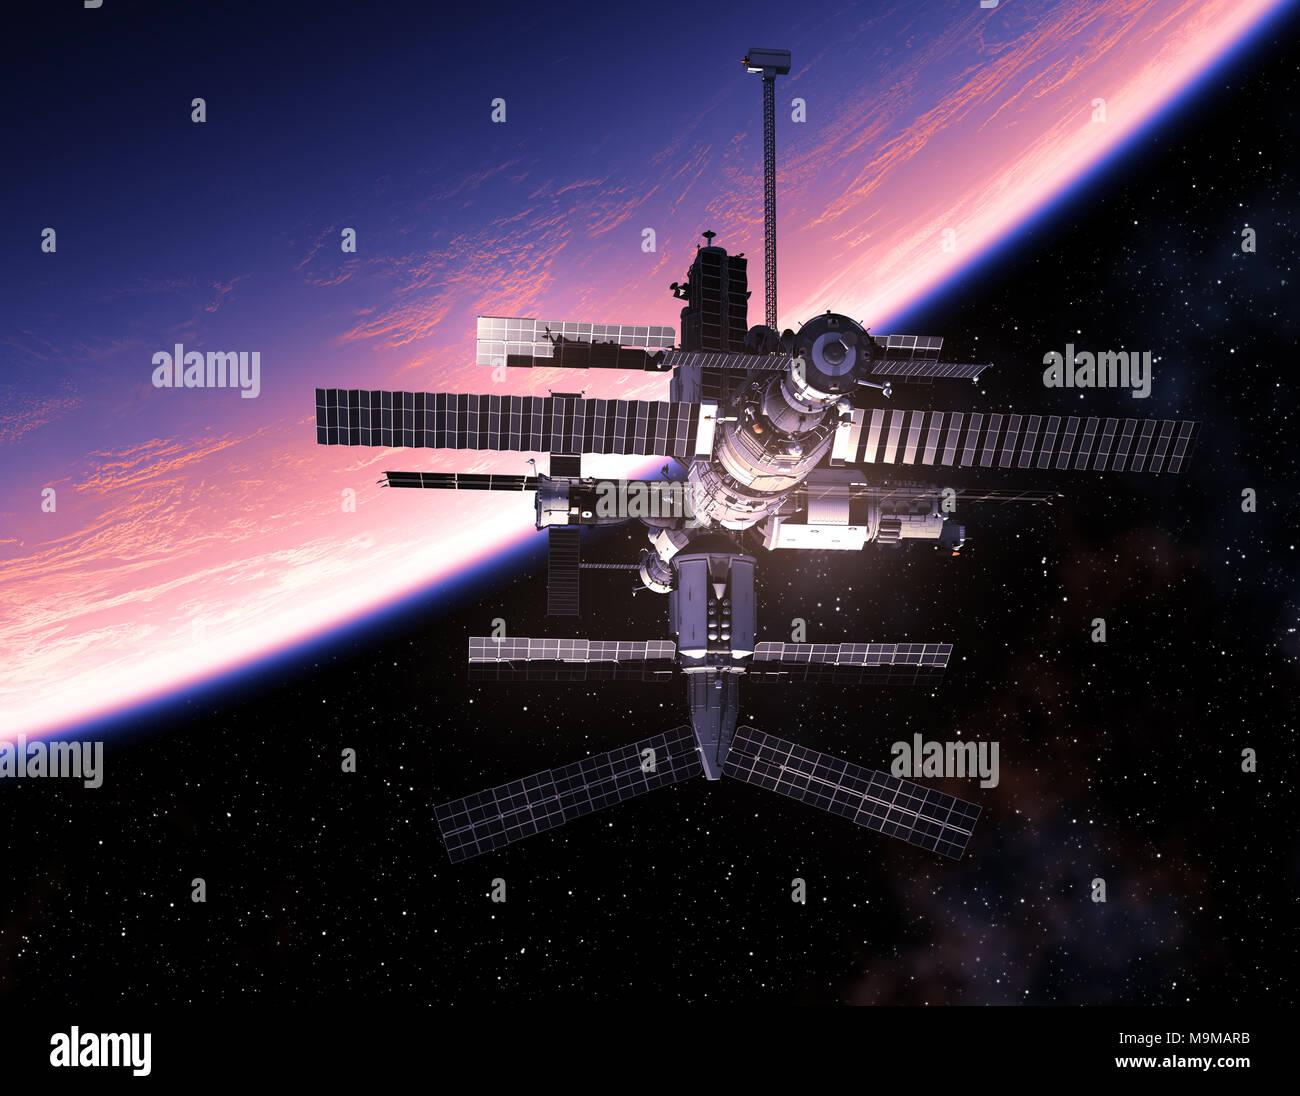 Space Station Orbiting Blue Planet. 3D Illustration. - Stock Image